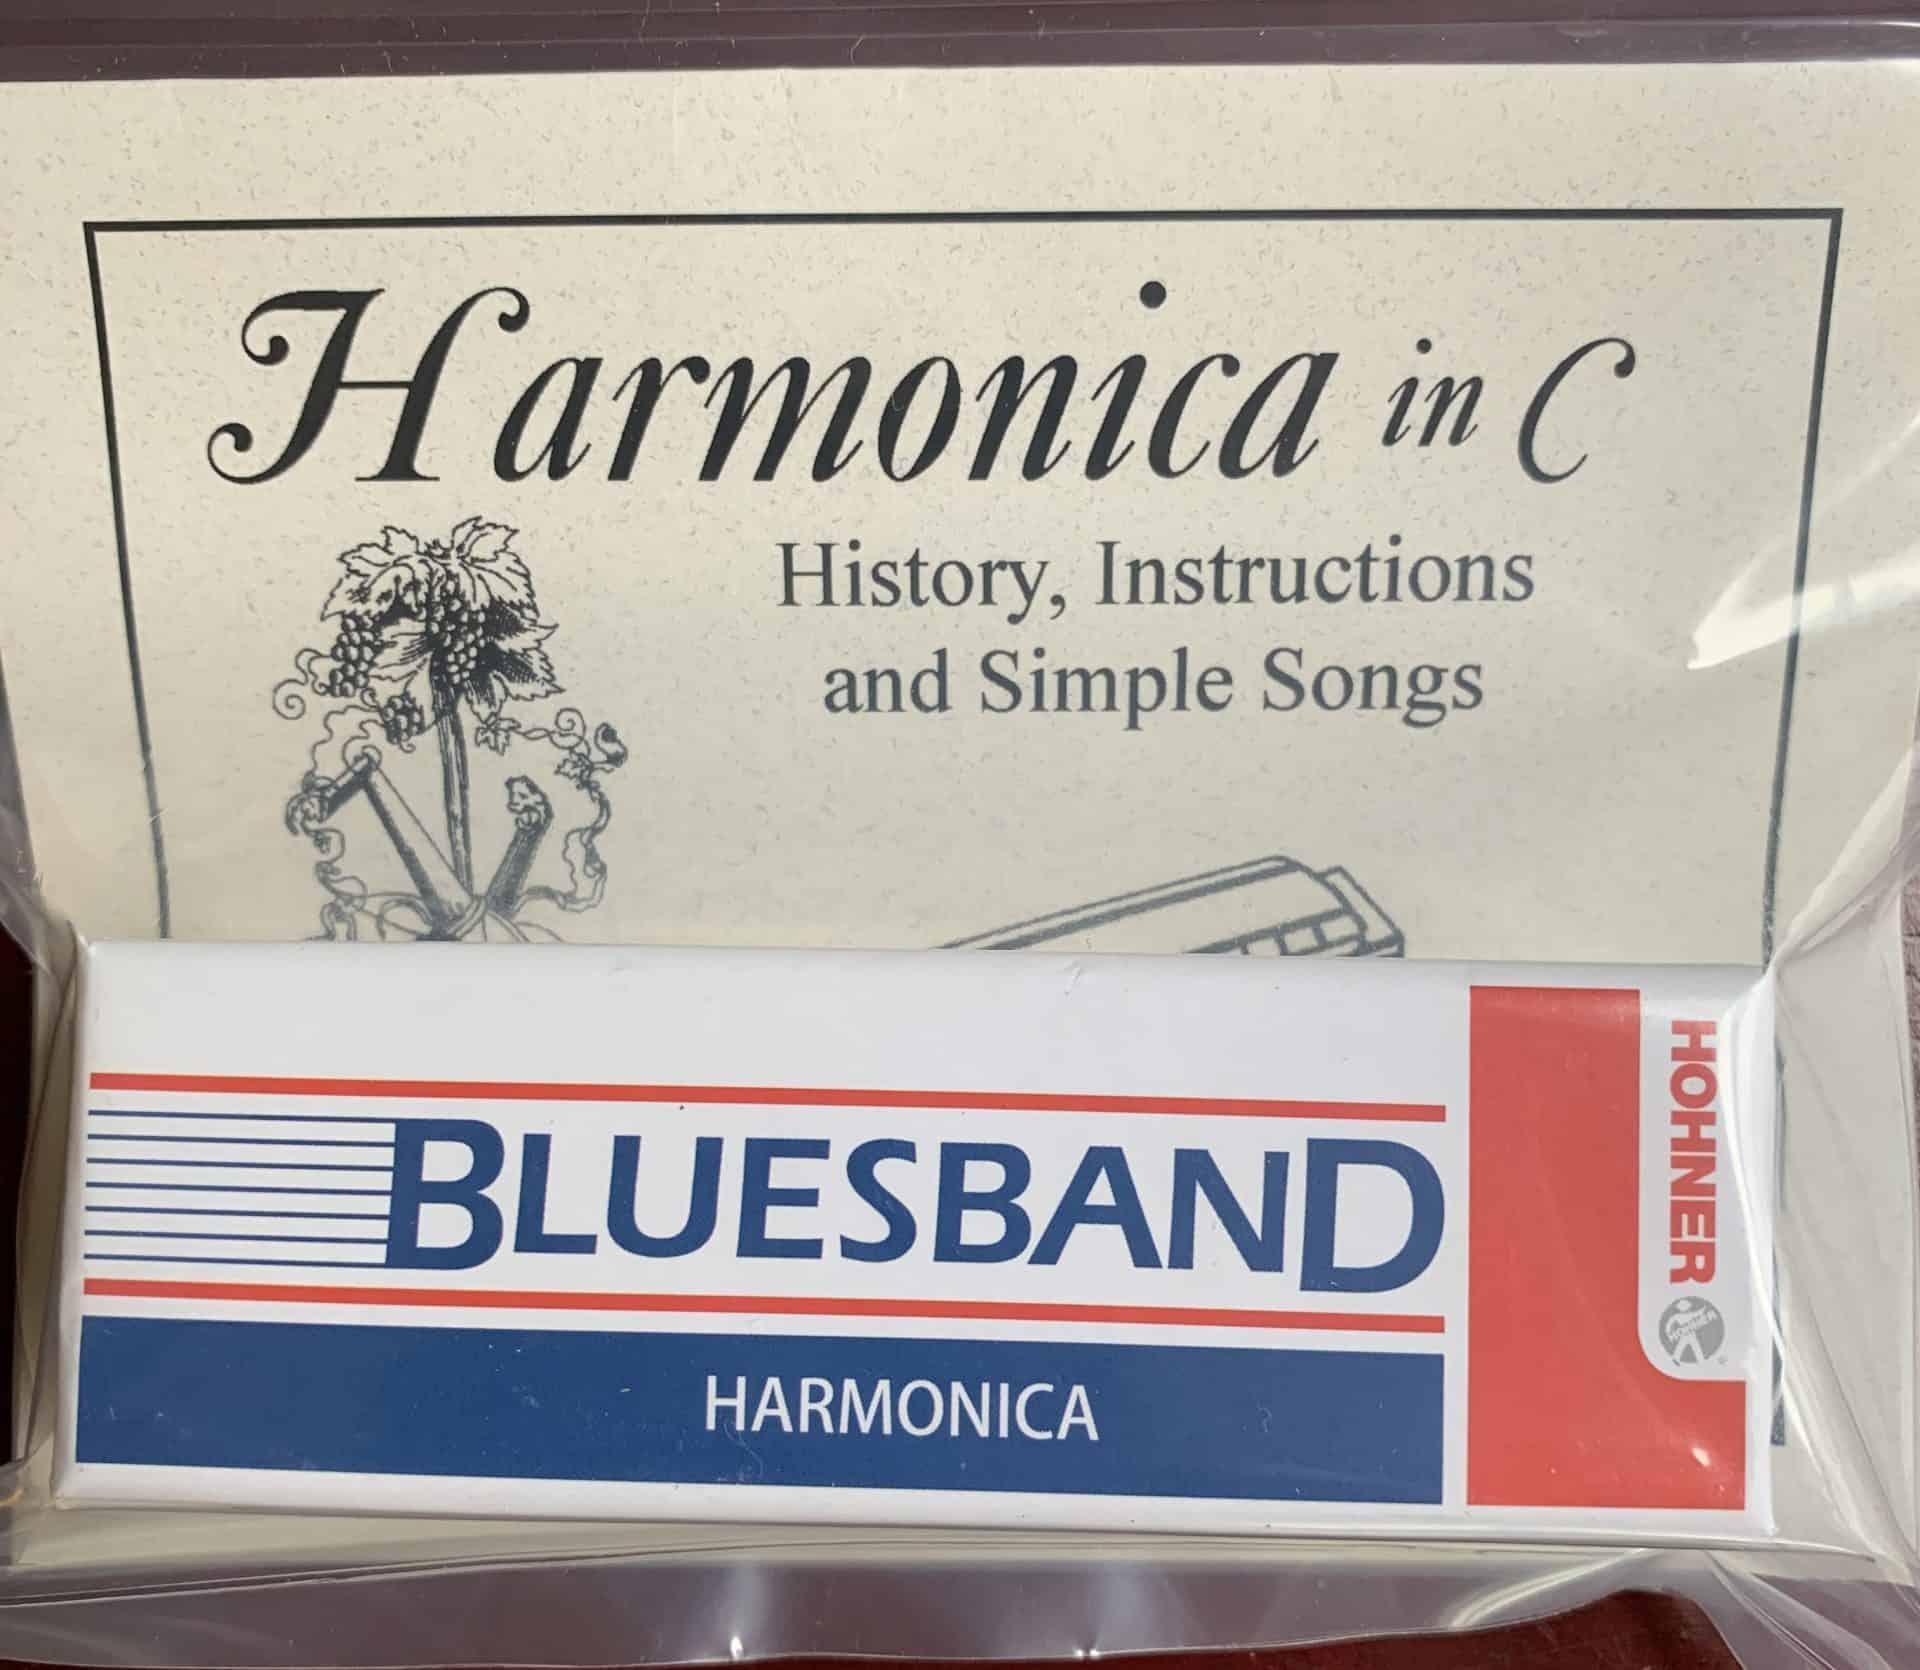 Harmonica in C